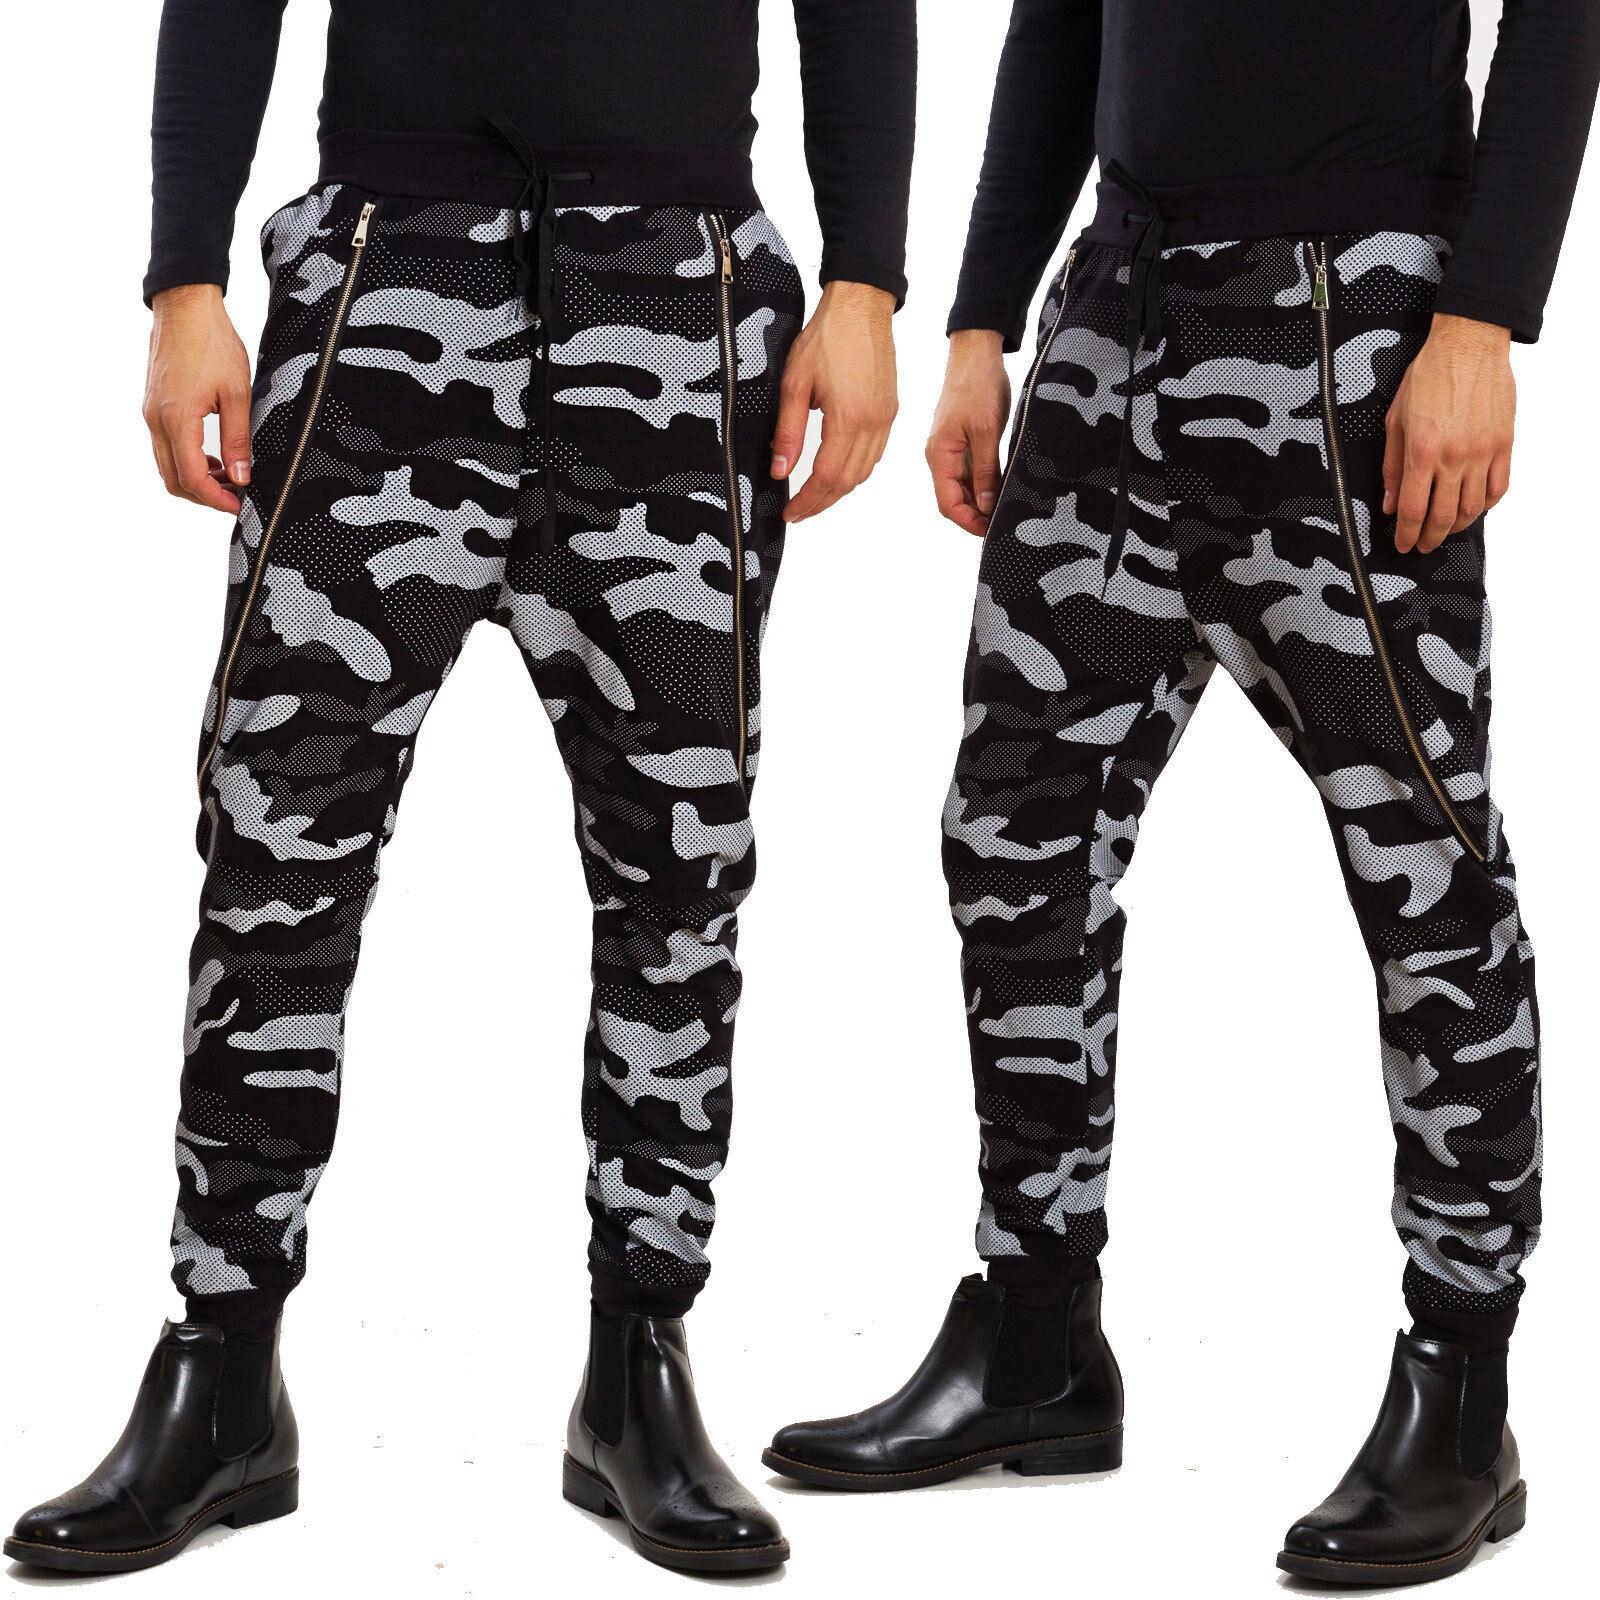 Dettagli su Pantaloni uomo tuta cavallo basso harem turca militari mimetici TOOCOOL 25502